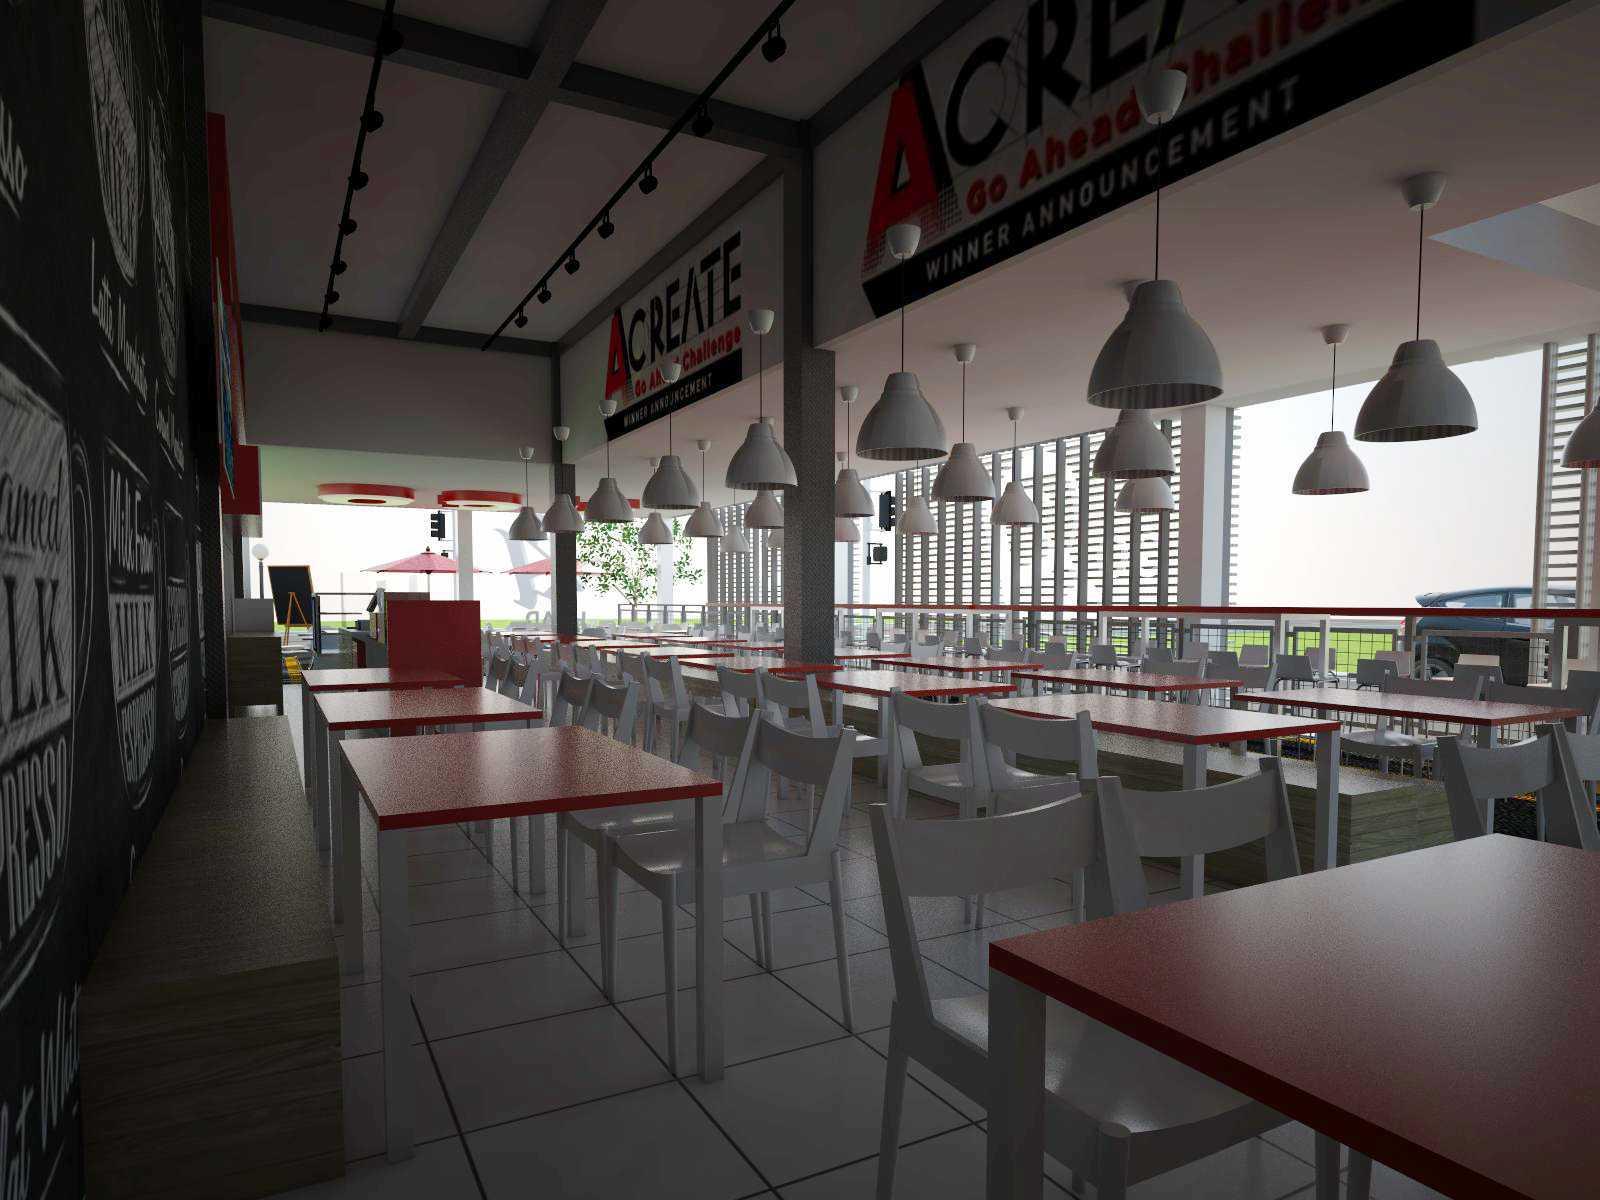 Andreas Fajar Ismunanto 7Co Cafe (Branding) Pontianak, Kota Pontianak, Kalimantan Barat, Indonesia Pontianak, Kota Pontianak, Kalimantan Barat, Indonesia 7-Cosampoerna-Mr Modern  38090